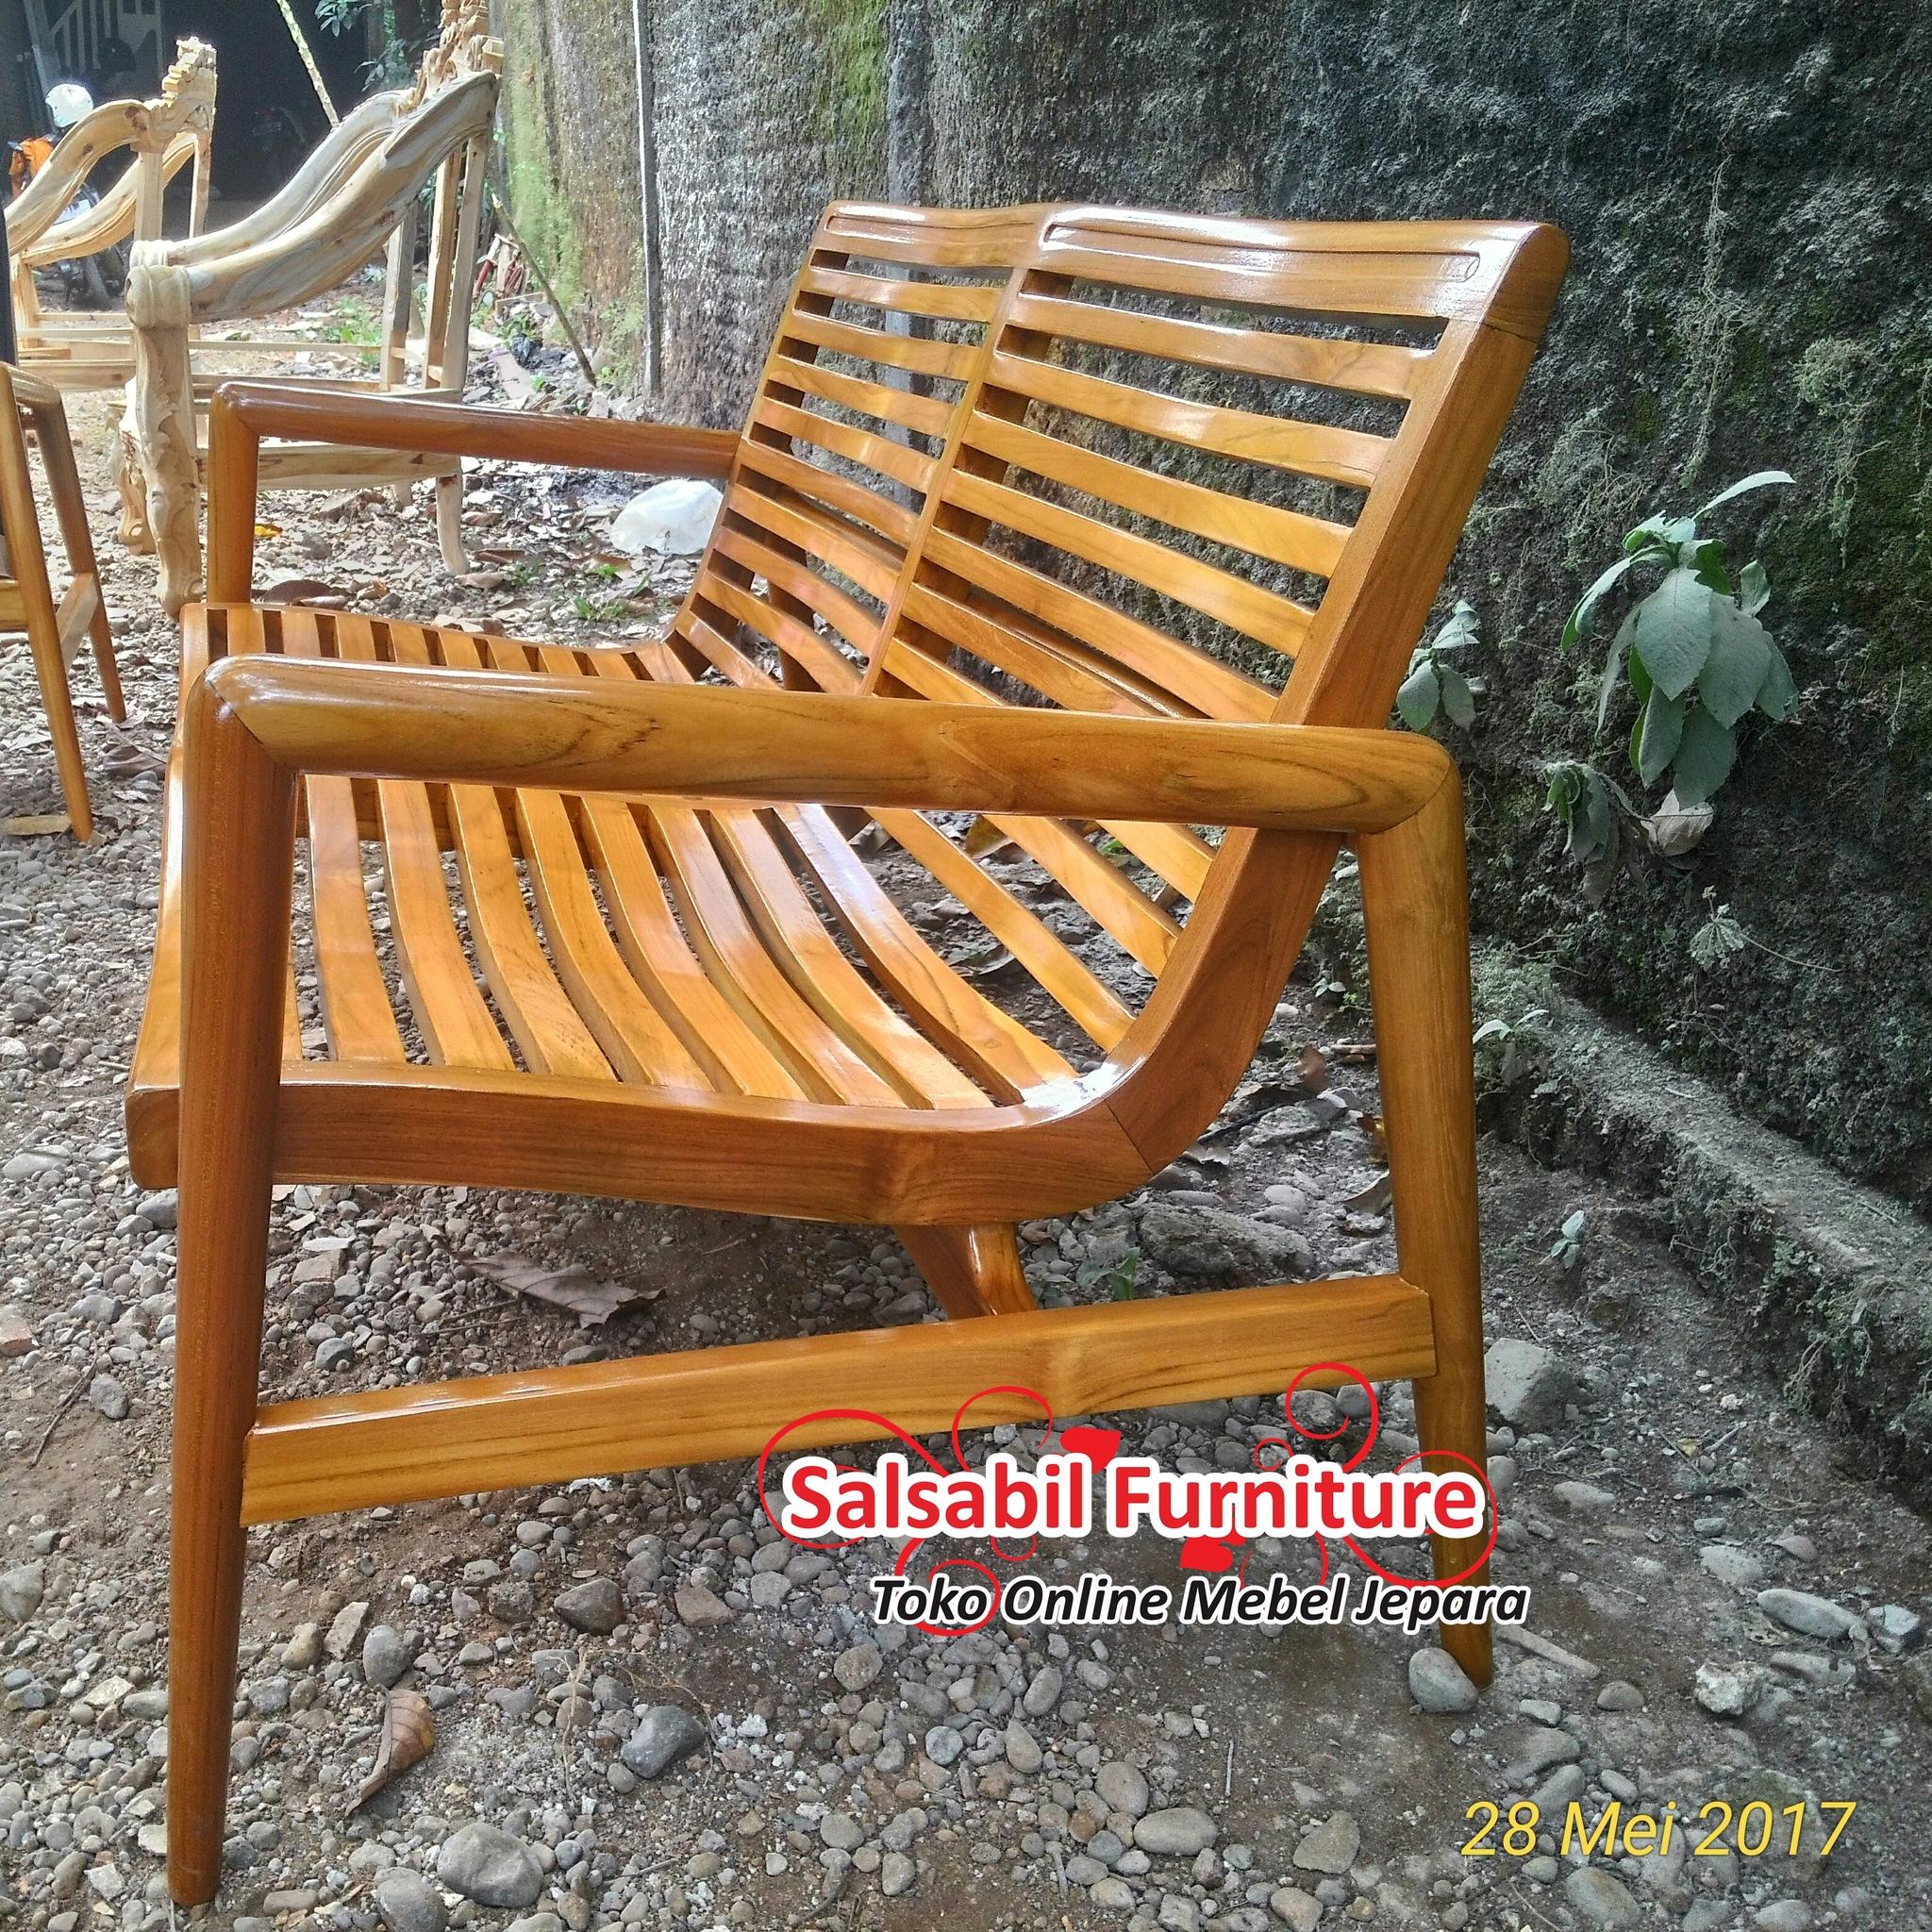 Kursi Retro Finger Arms 2 Seater - salsabilfurniture.com - +6285875166325